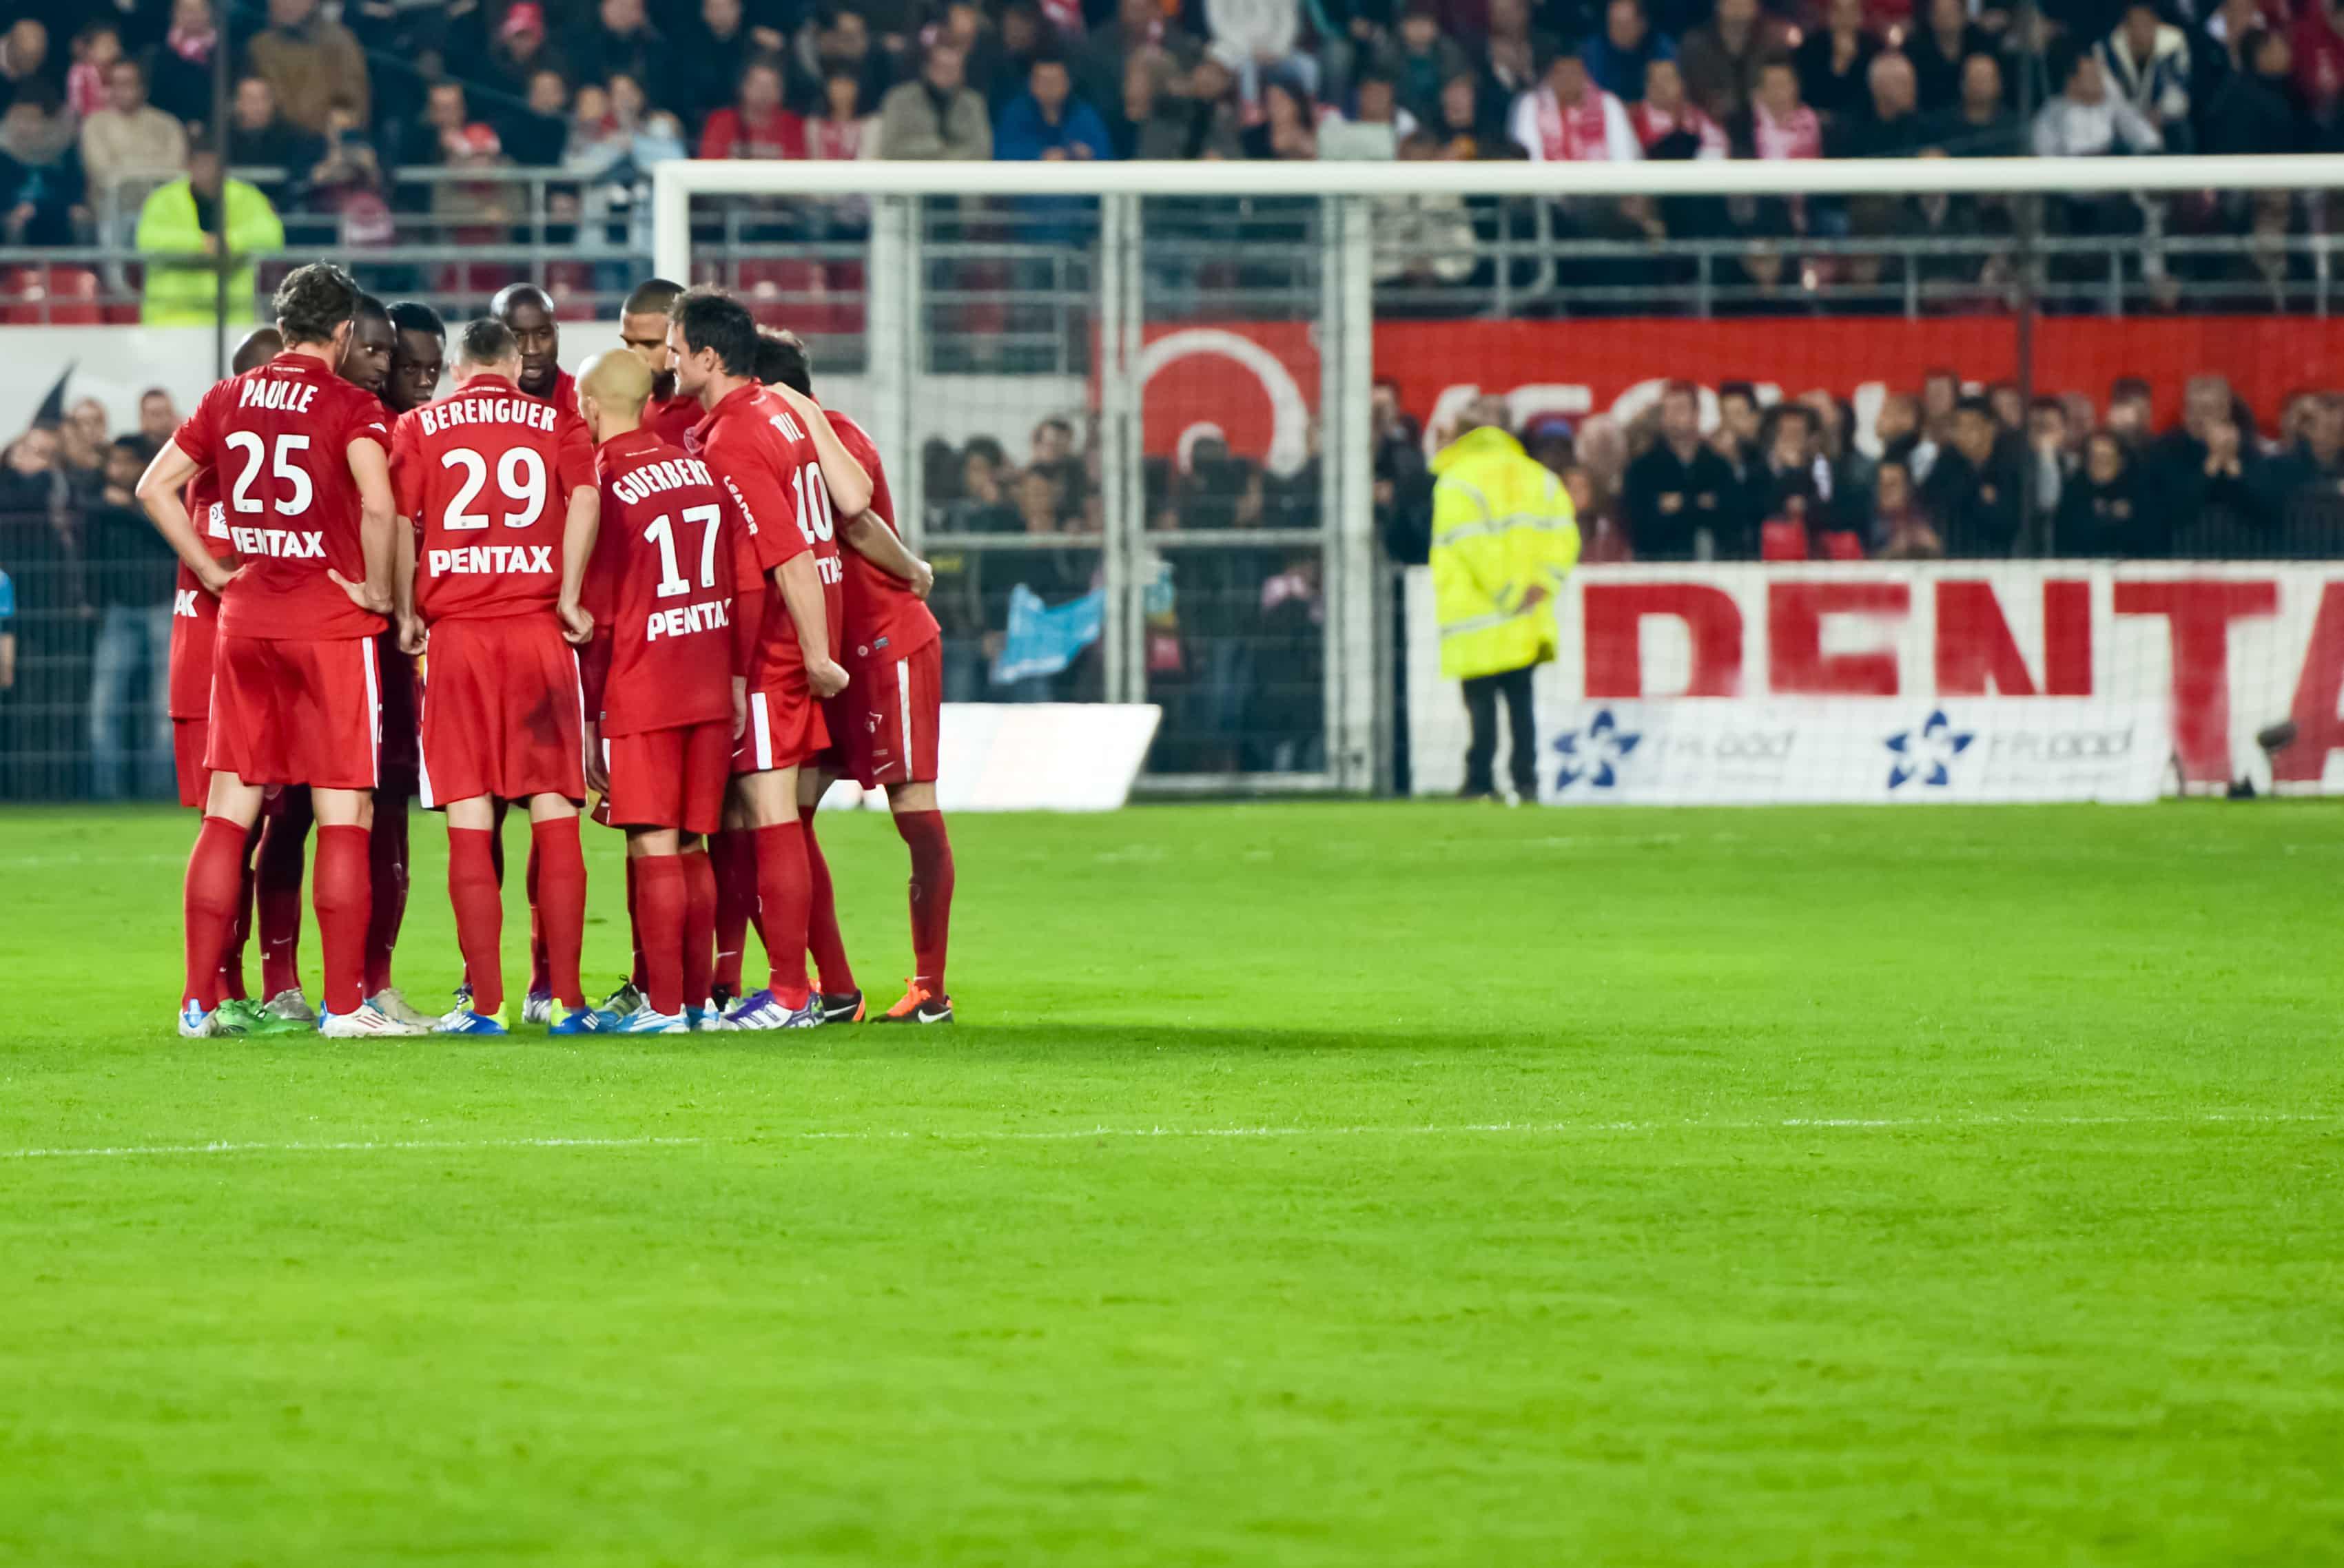 Hasil Pertandingan Dijon FCO